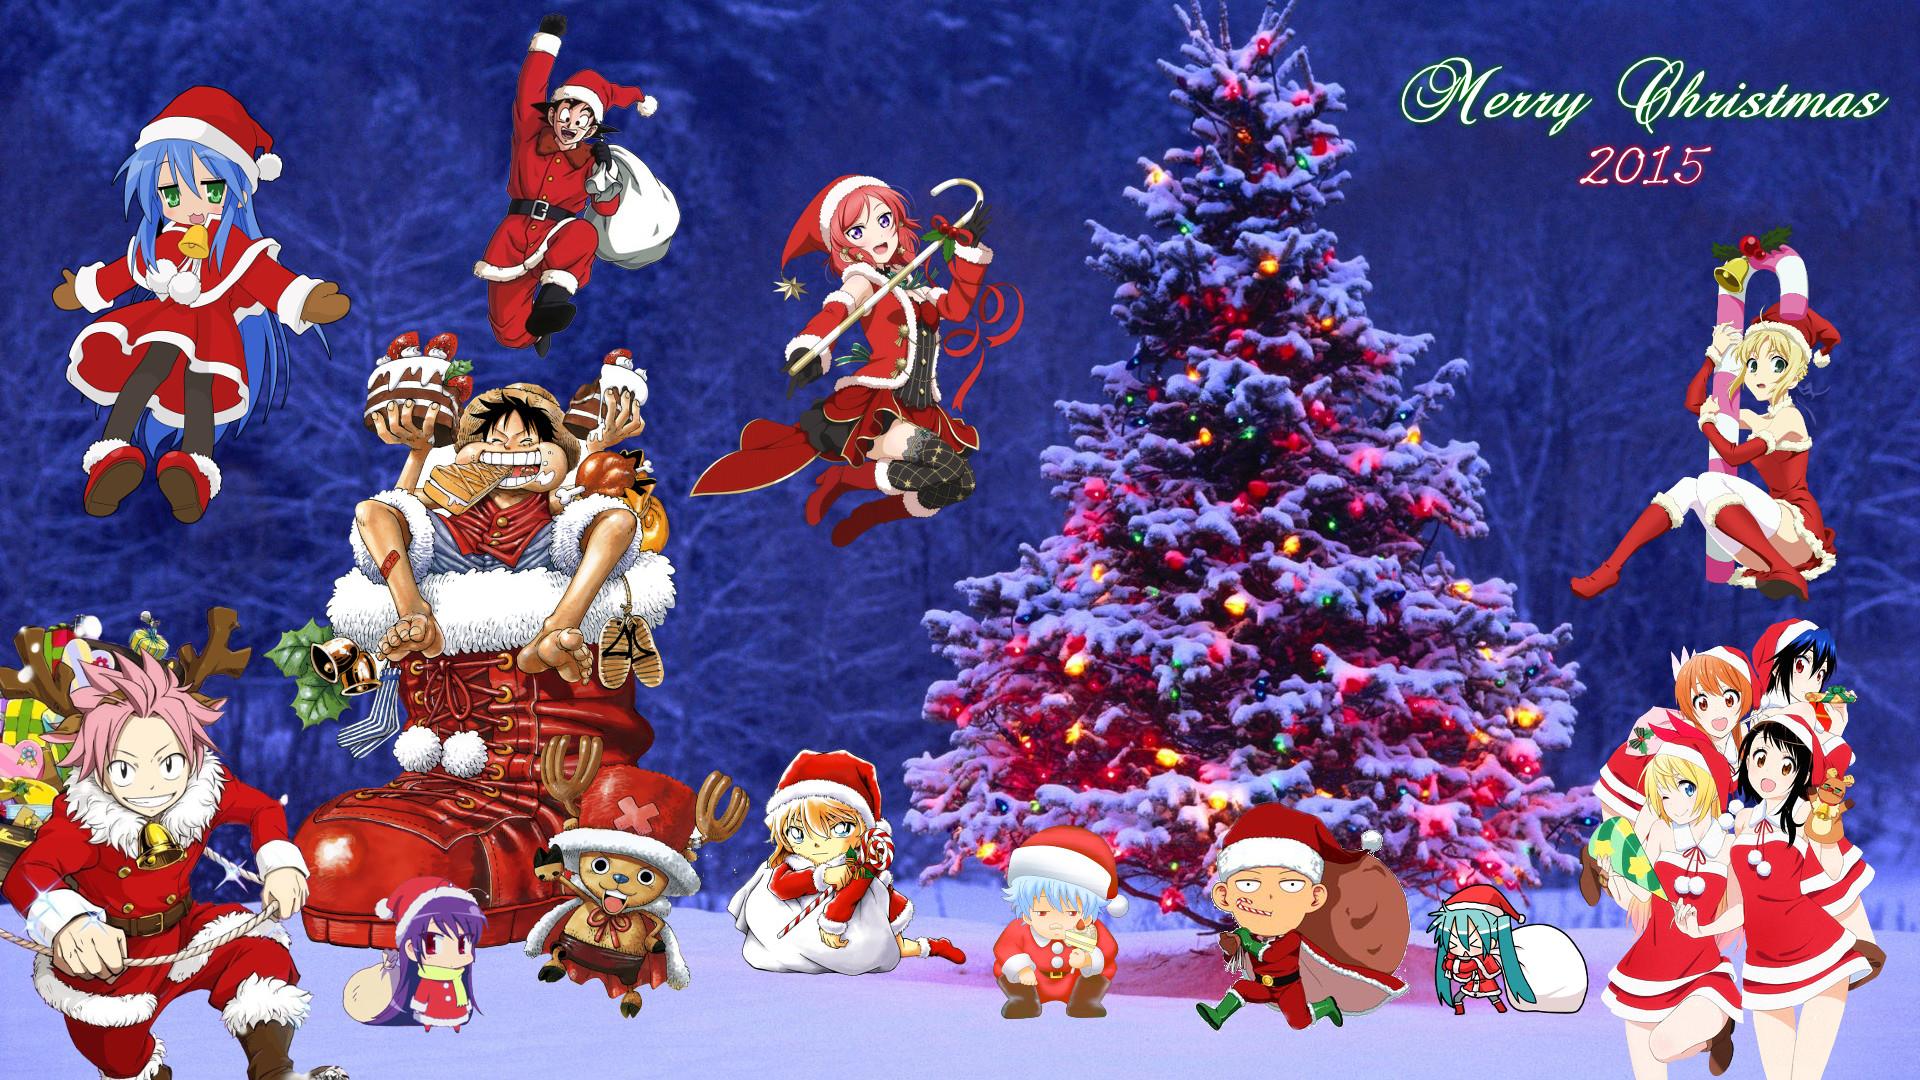 … Anime Christmas Wallpaper 2015 (Version 2) by NekoTheOtaku